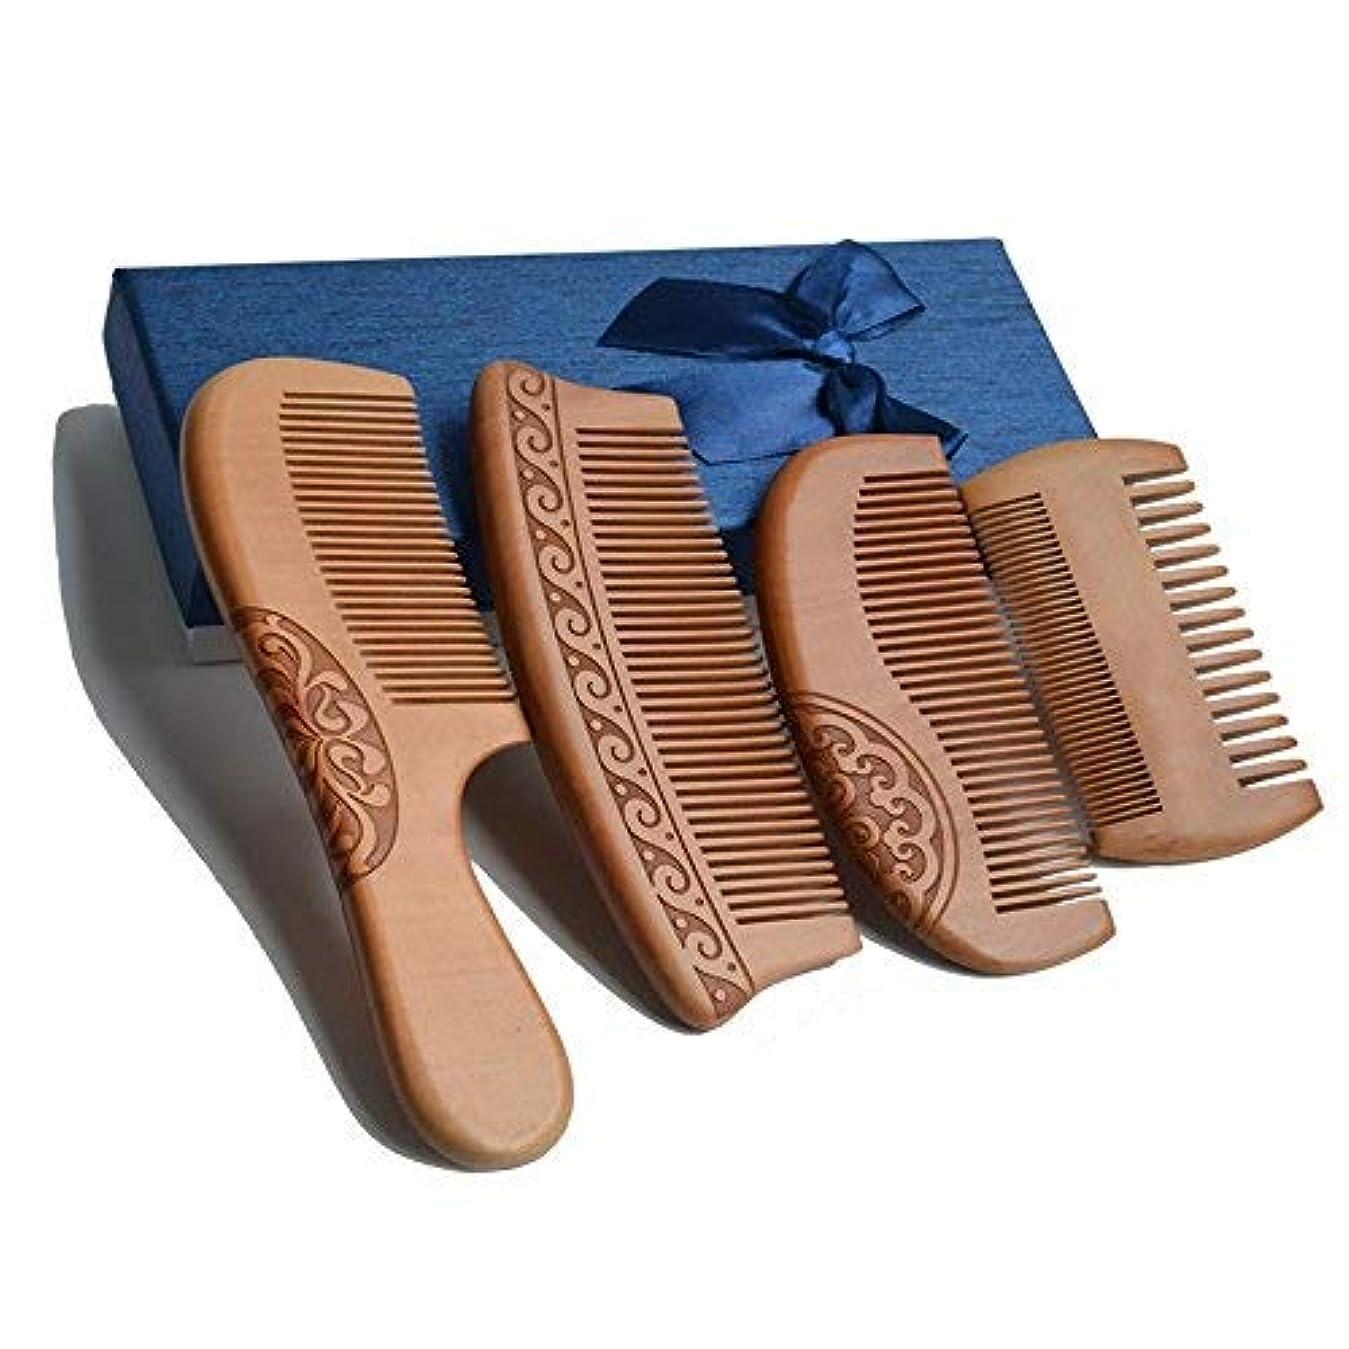 4Pcs Wooden Hair Comb No Static Hair Detangler Detangling Comb with Premium Gift Box [並行輸入品]